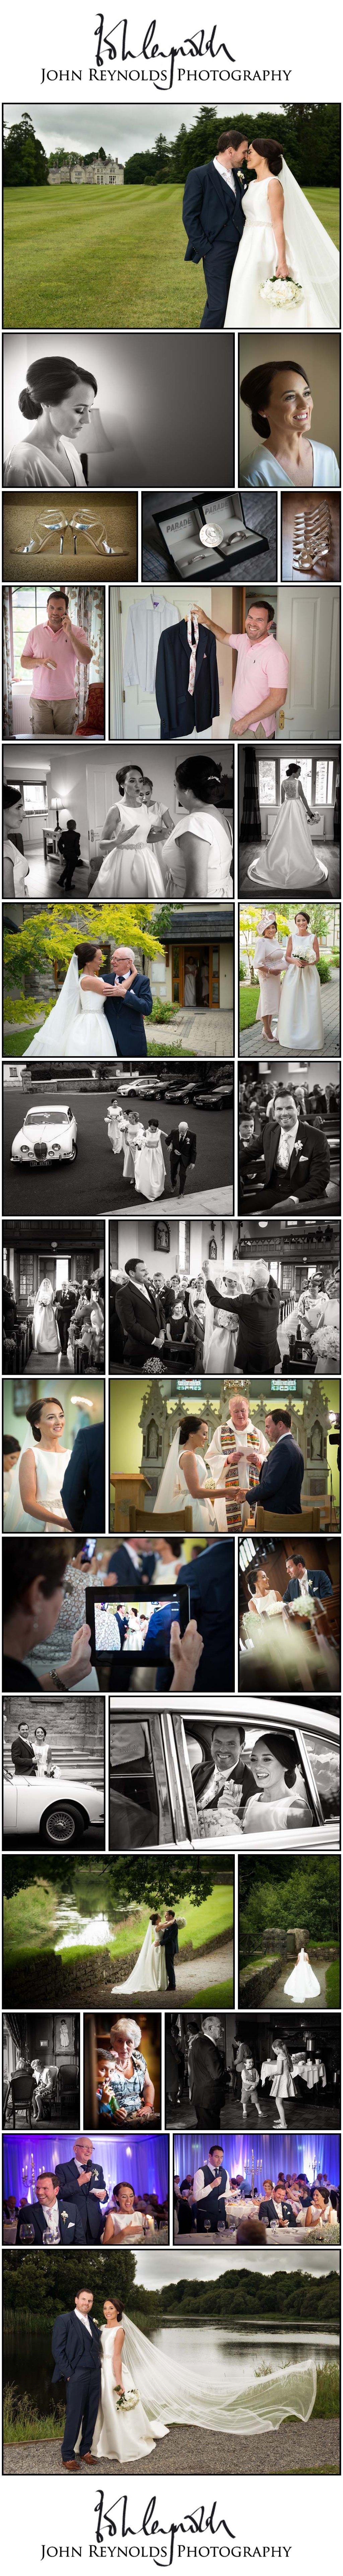 Blog Collage-Eimear & William